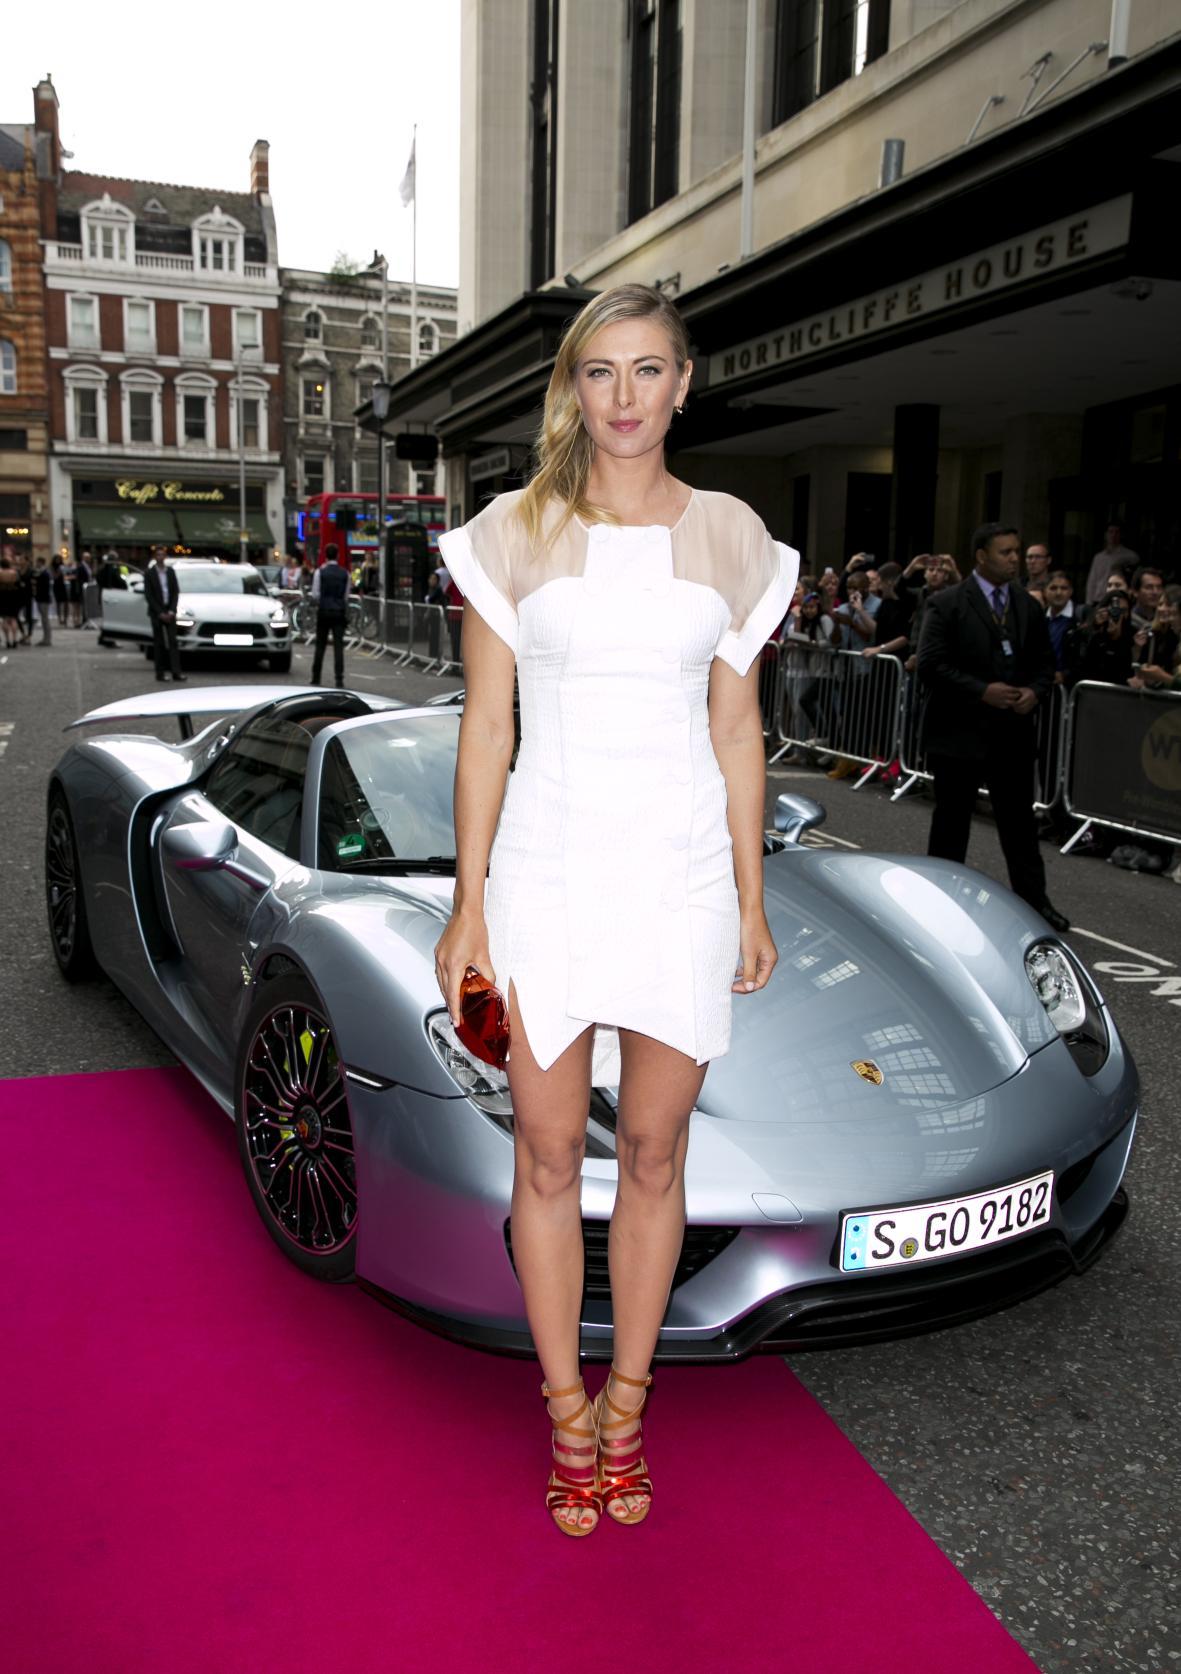 Maria_Sharapova_and_the_Porsche_918_Spyder_arrive_at_the WTA_Kensington_Roof_Gardens